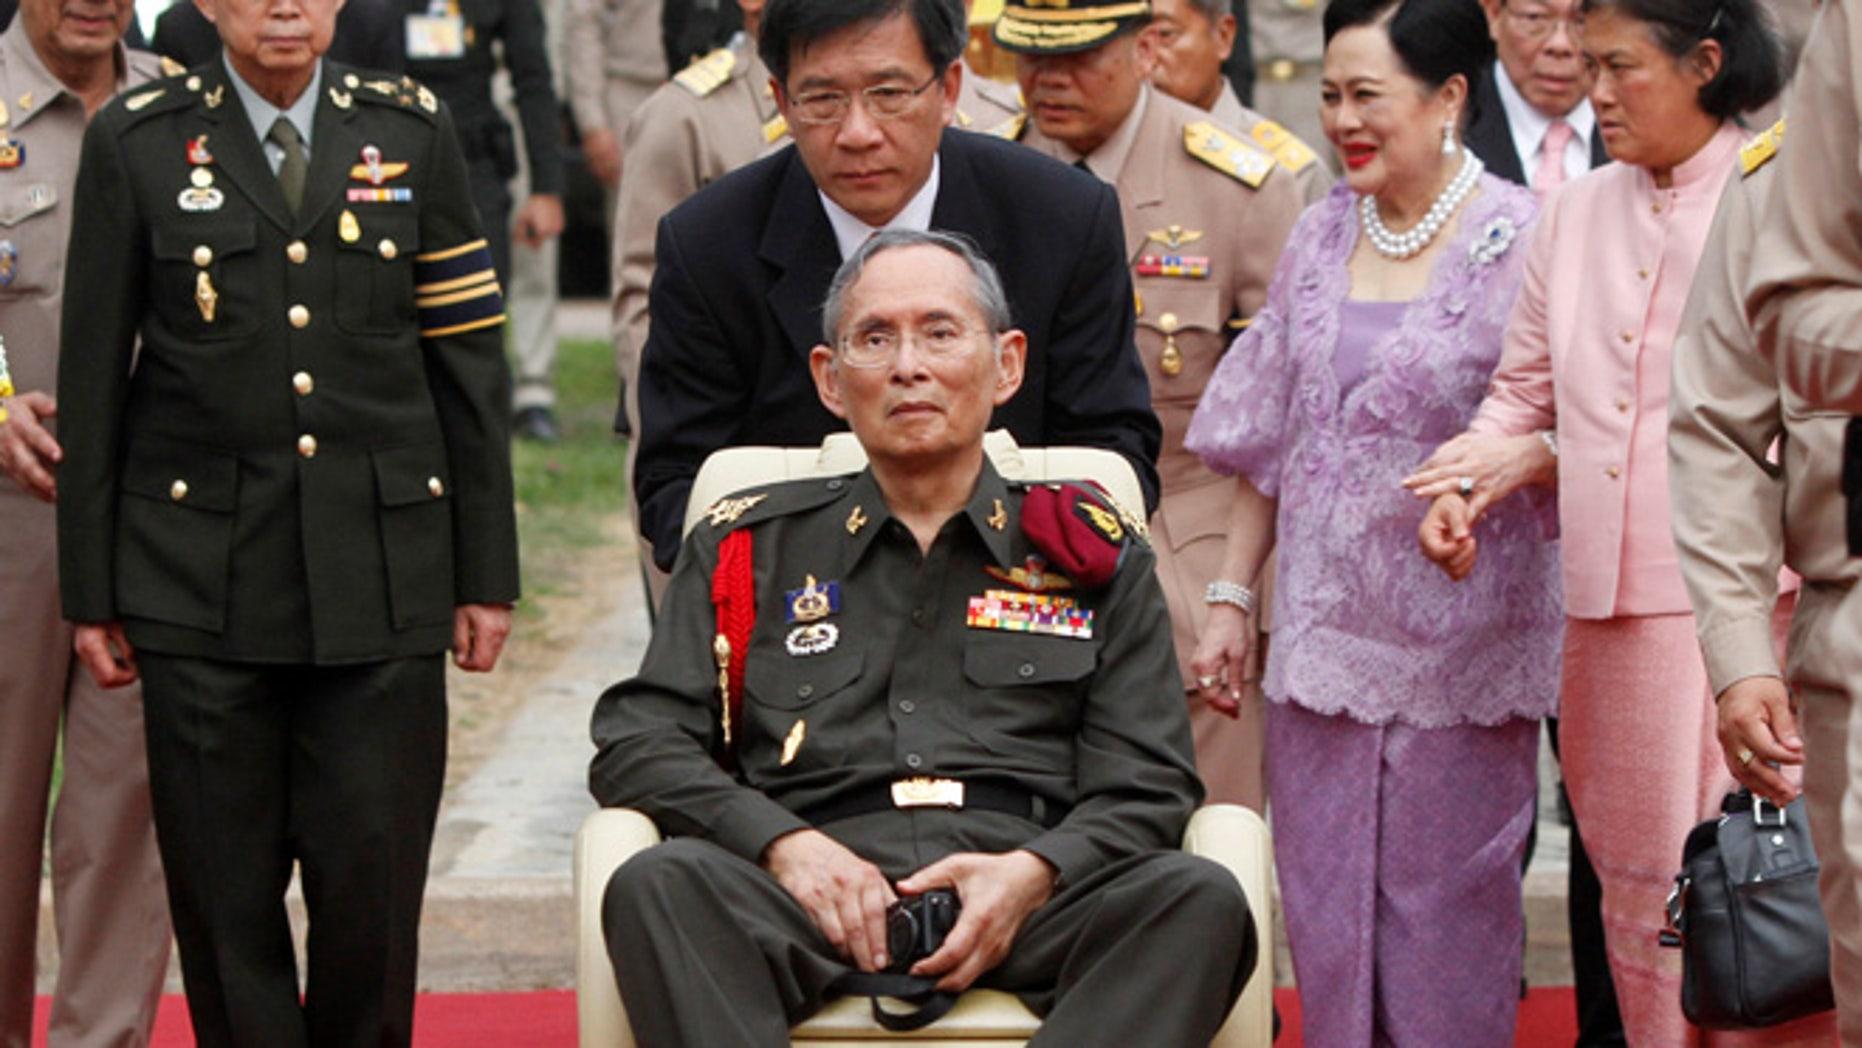 Thailand's King Bhumibol Adulyadej, center, visits Thung Makham in Ayutthaya province, north of Bangkok.